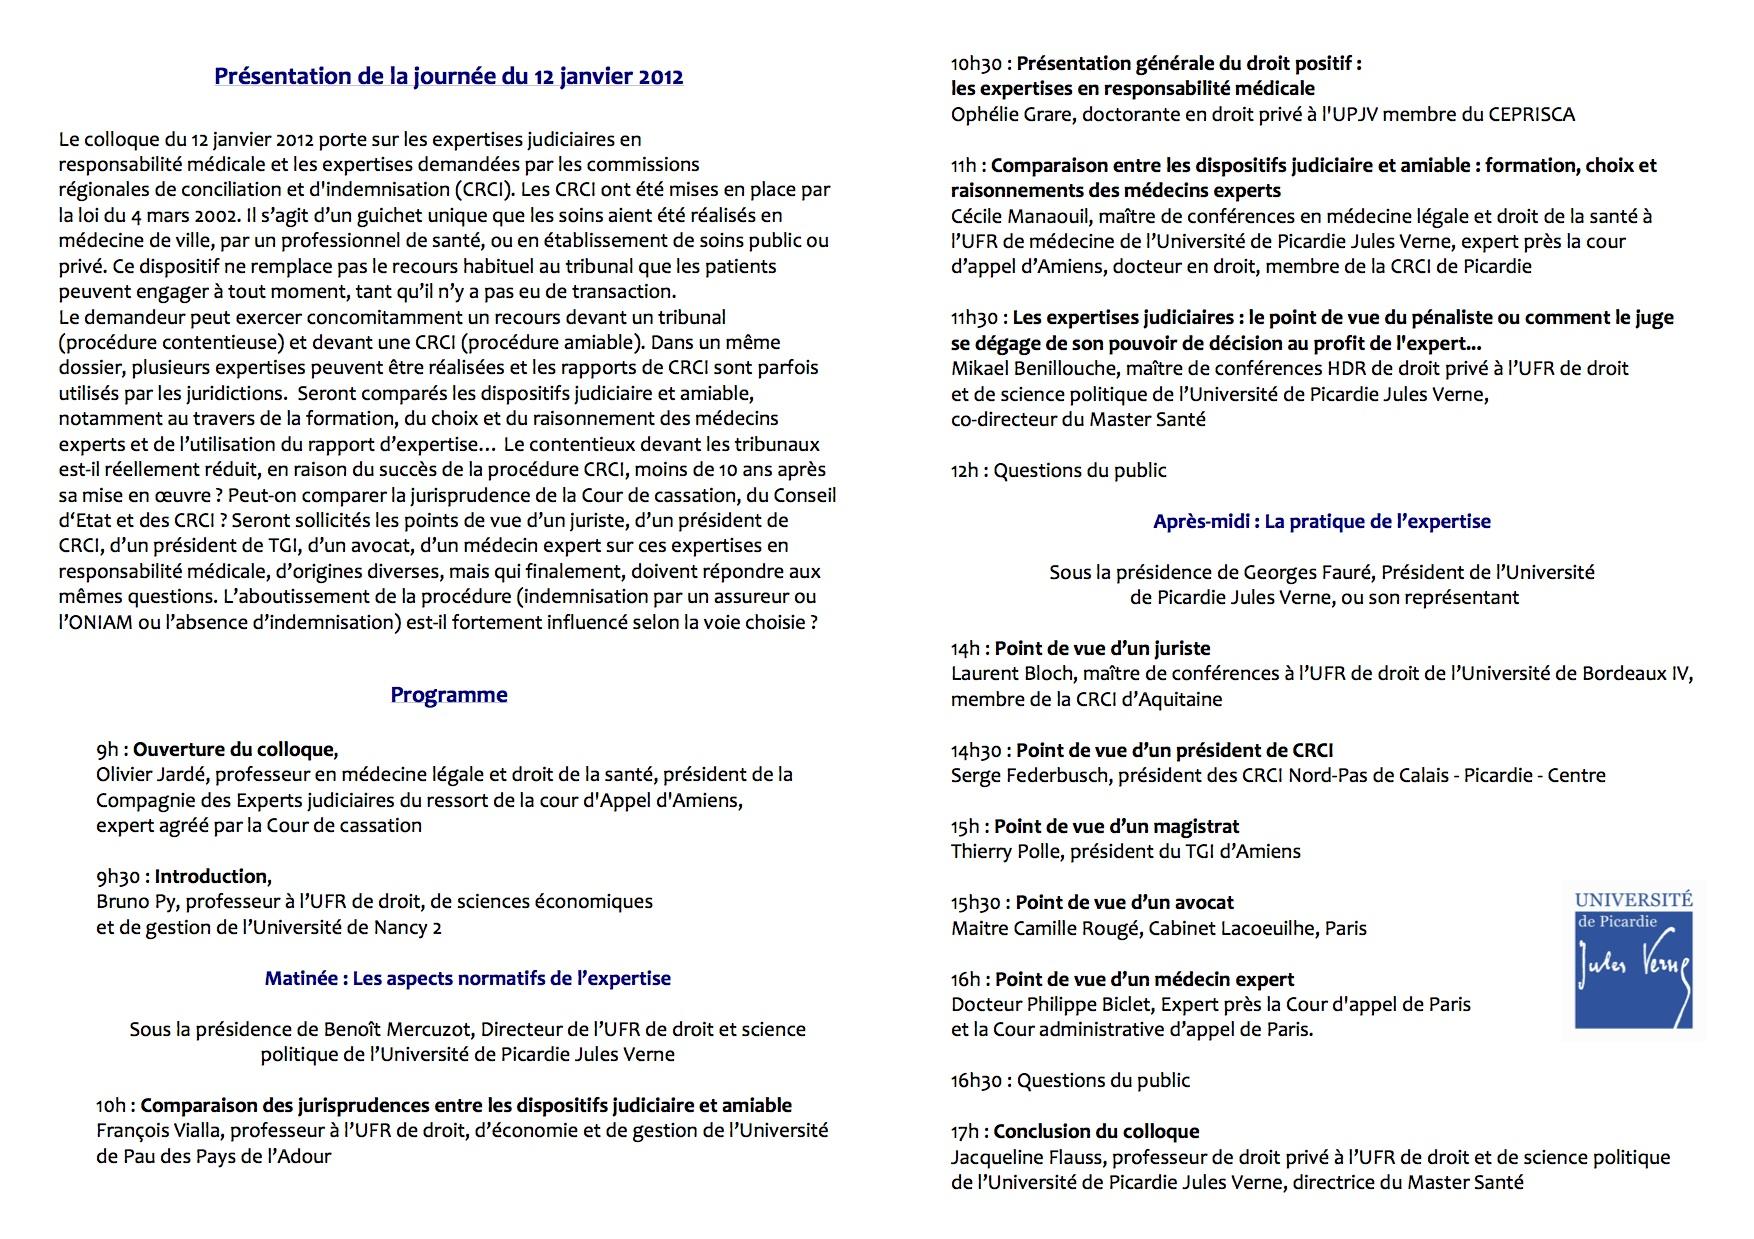 PROGRAMME-_Les_expertises_judiciaires-COLLOQUE_-_12_janvier_2012_-_CEPRISCA